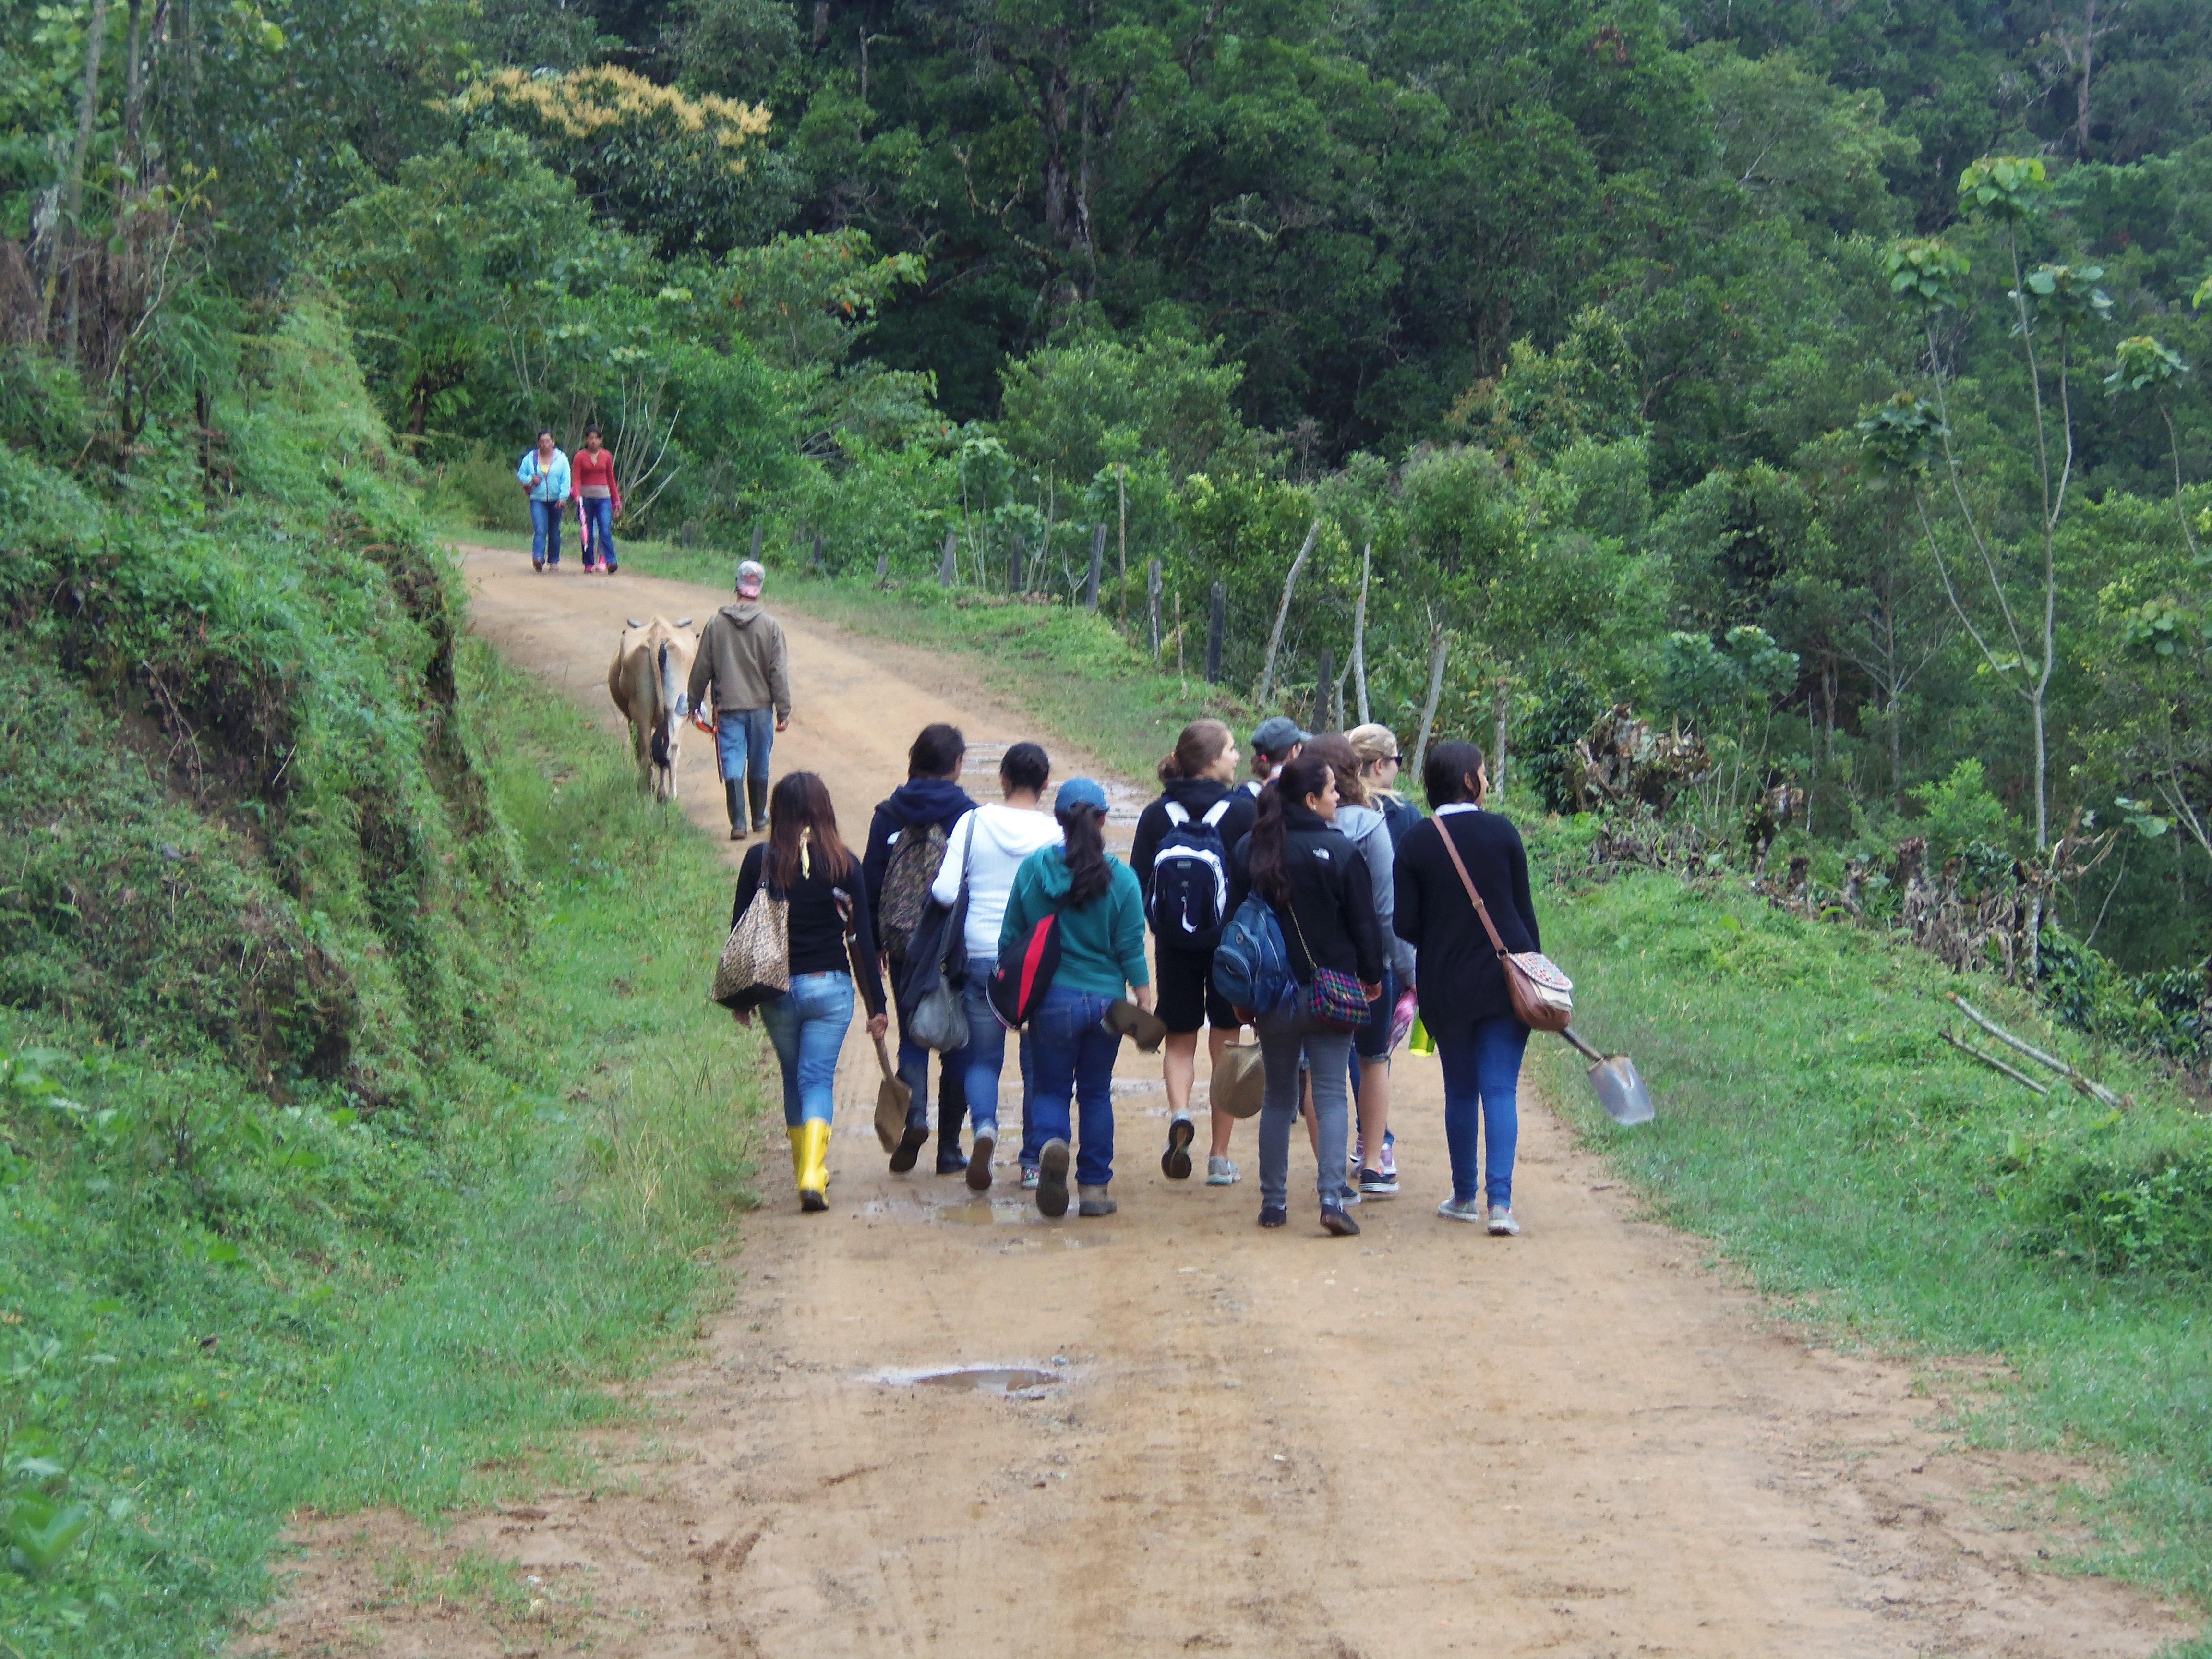 Gap Year Program - Costa Rica/Guatemala Gap Semester by Dream Volunteers  3